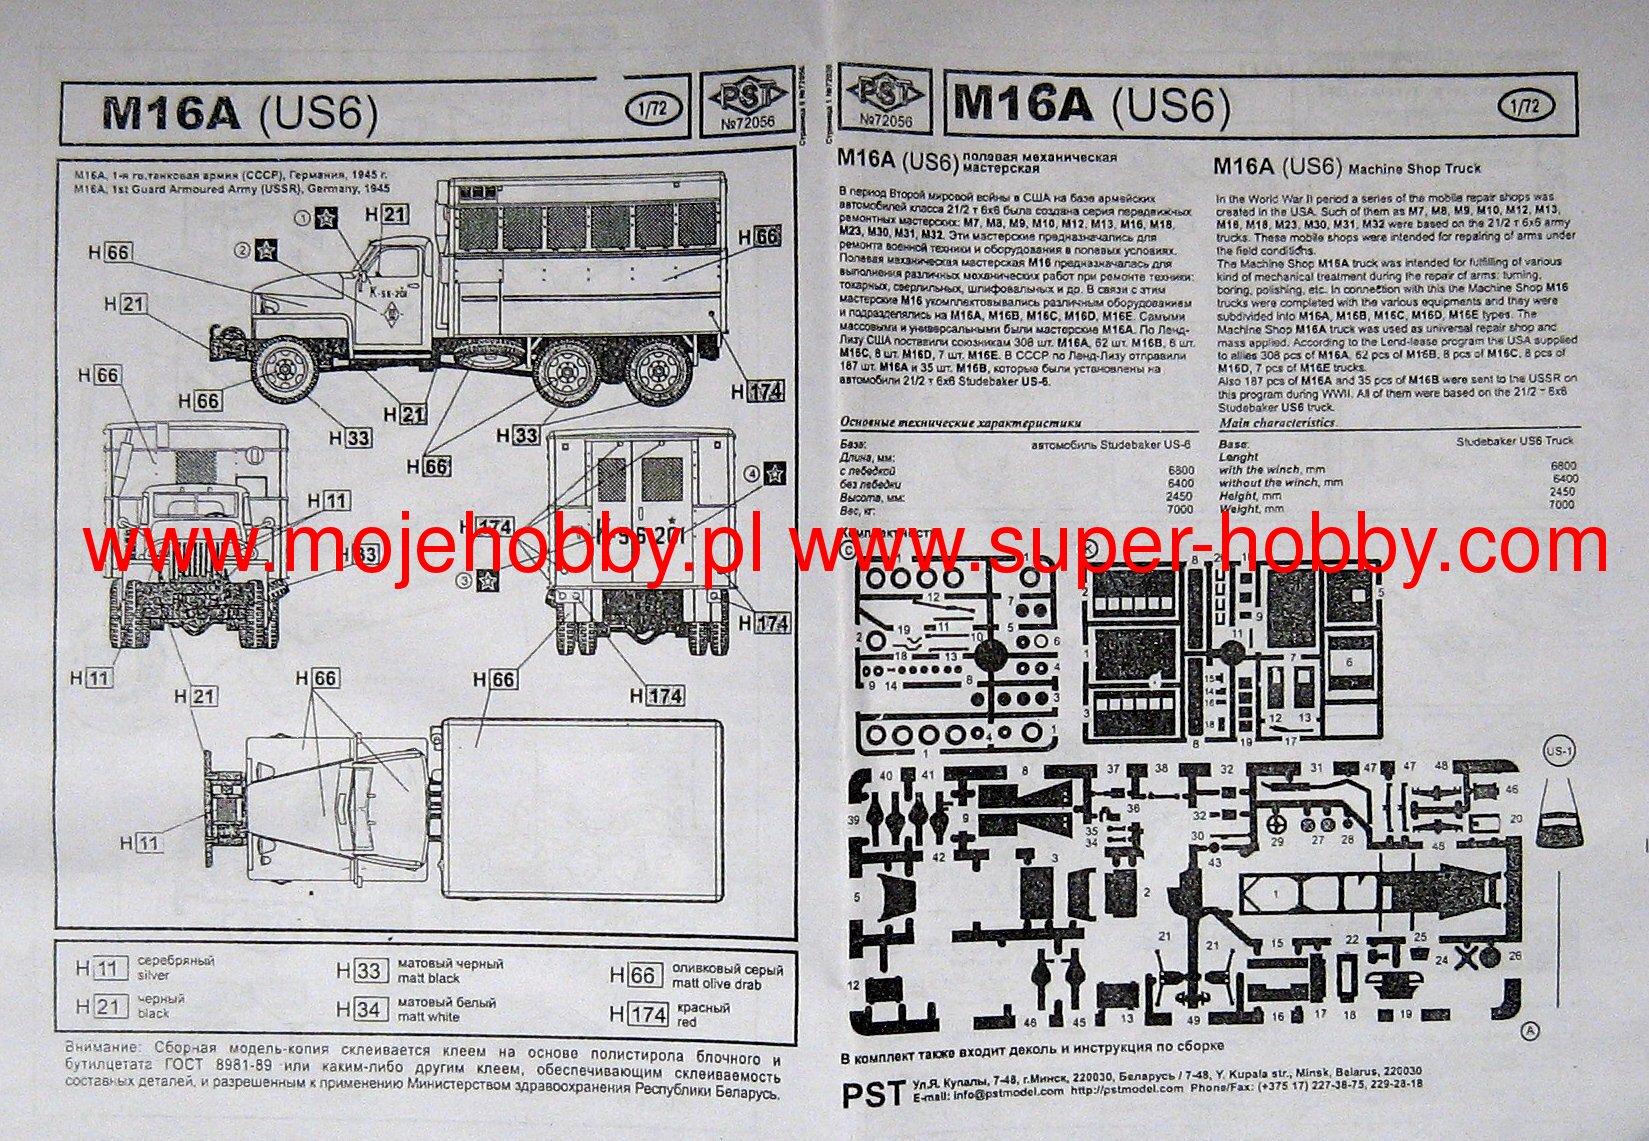 Soviet M16a Machine Shop Truck On Studebaker Us6 Pst 72056 Engine Diagrams 1 Pst72056 2